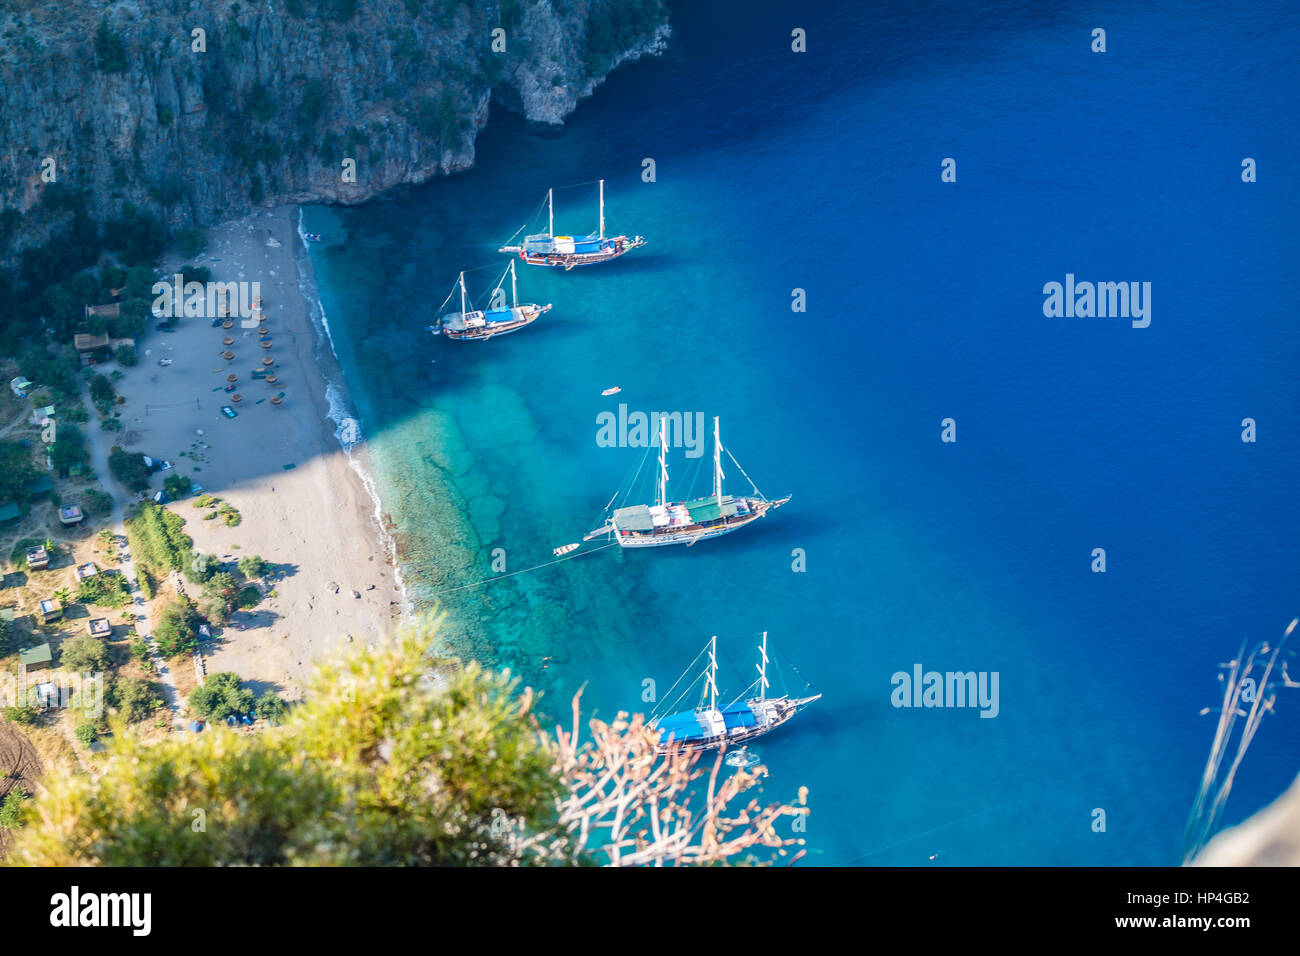 Butterfly Valley sea beach and boats scene - kelebekler vadisi deniz tekne plaj manzara Stock Photo